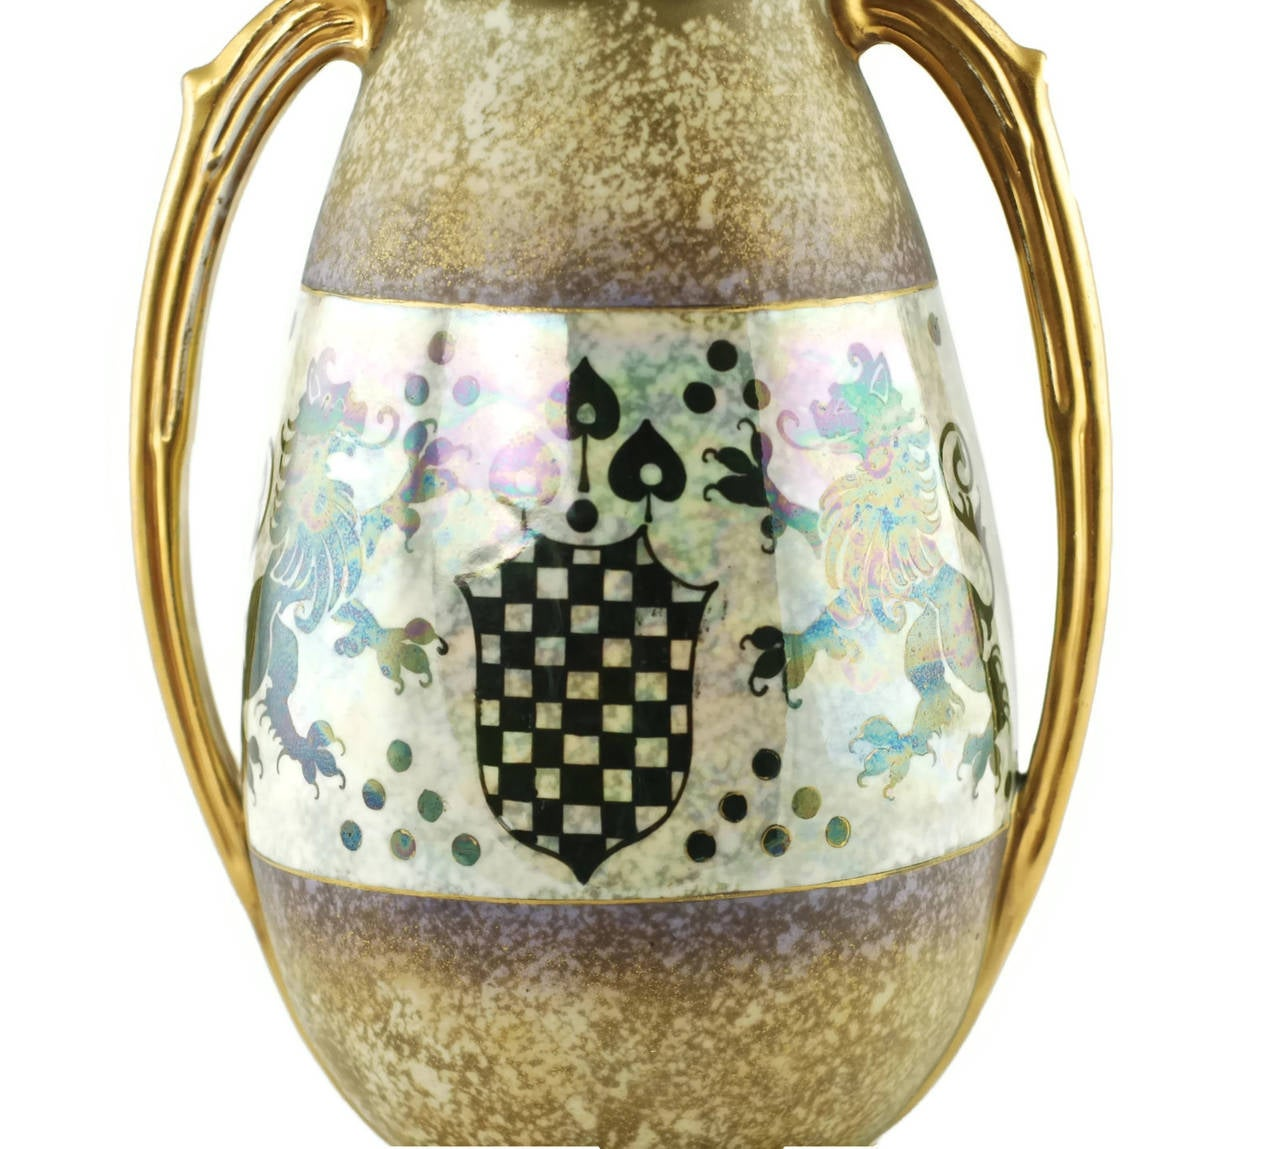 Art Nouveau Riessner & Kessel Amphora Turn Teplitz Two-Handled Vase with Iridized Glaze For Sale